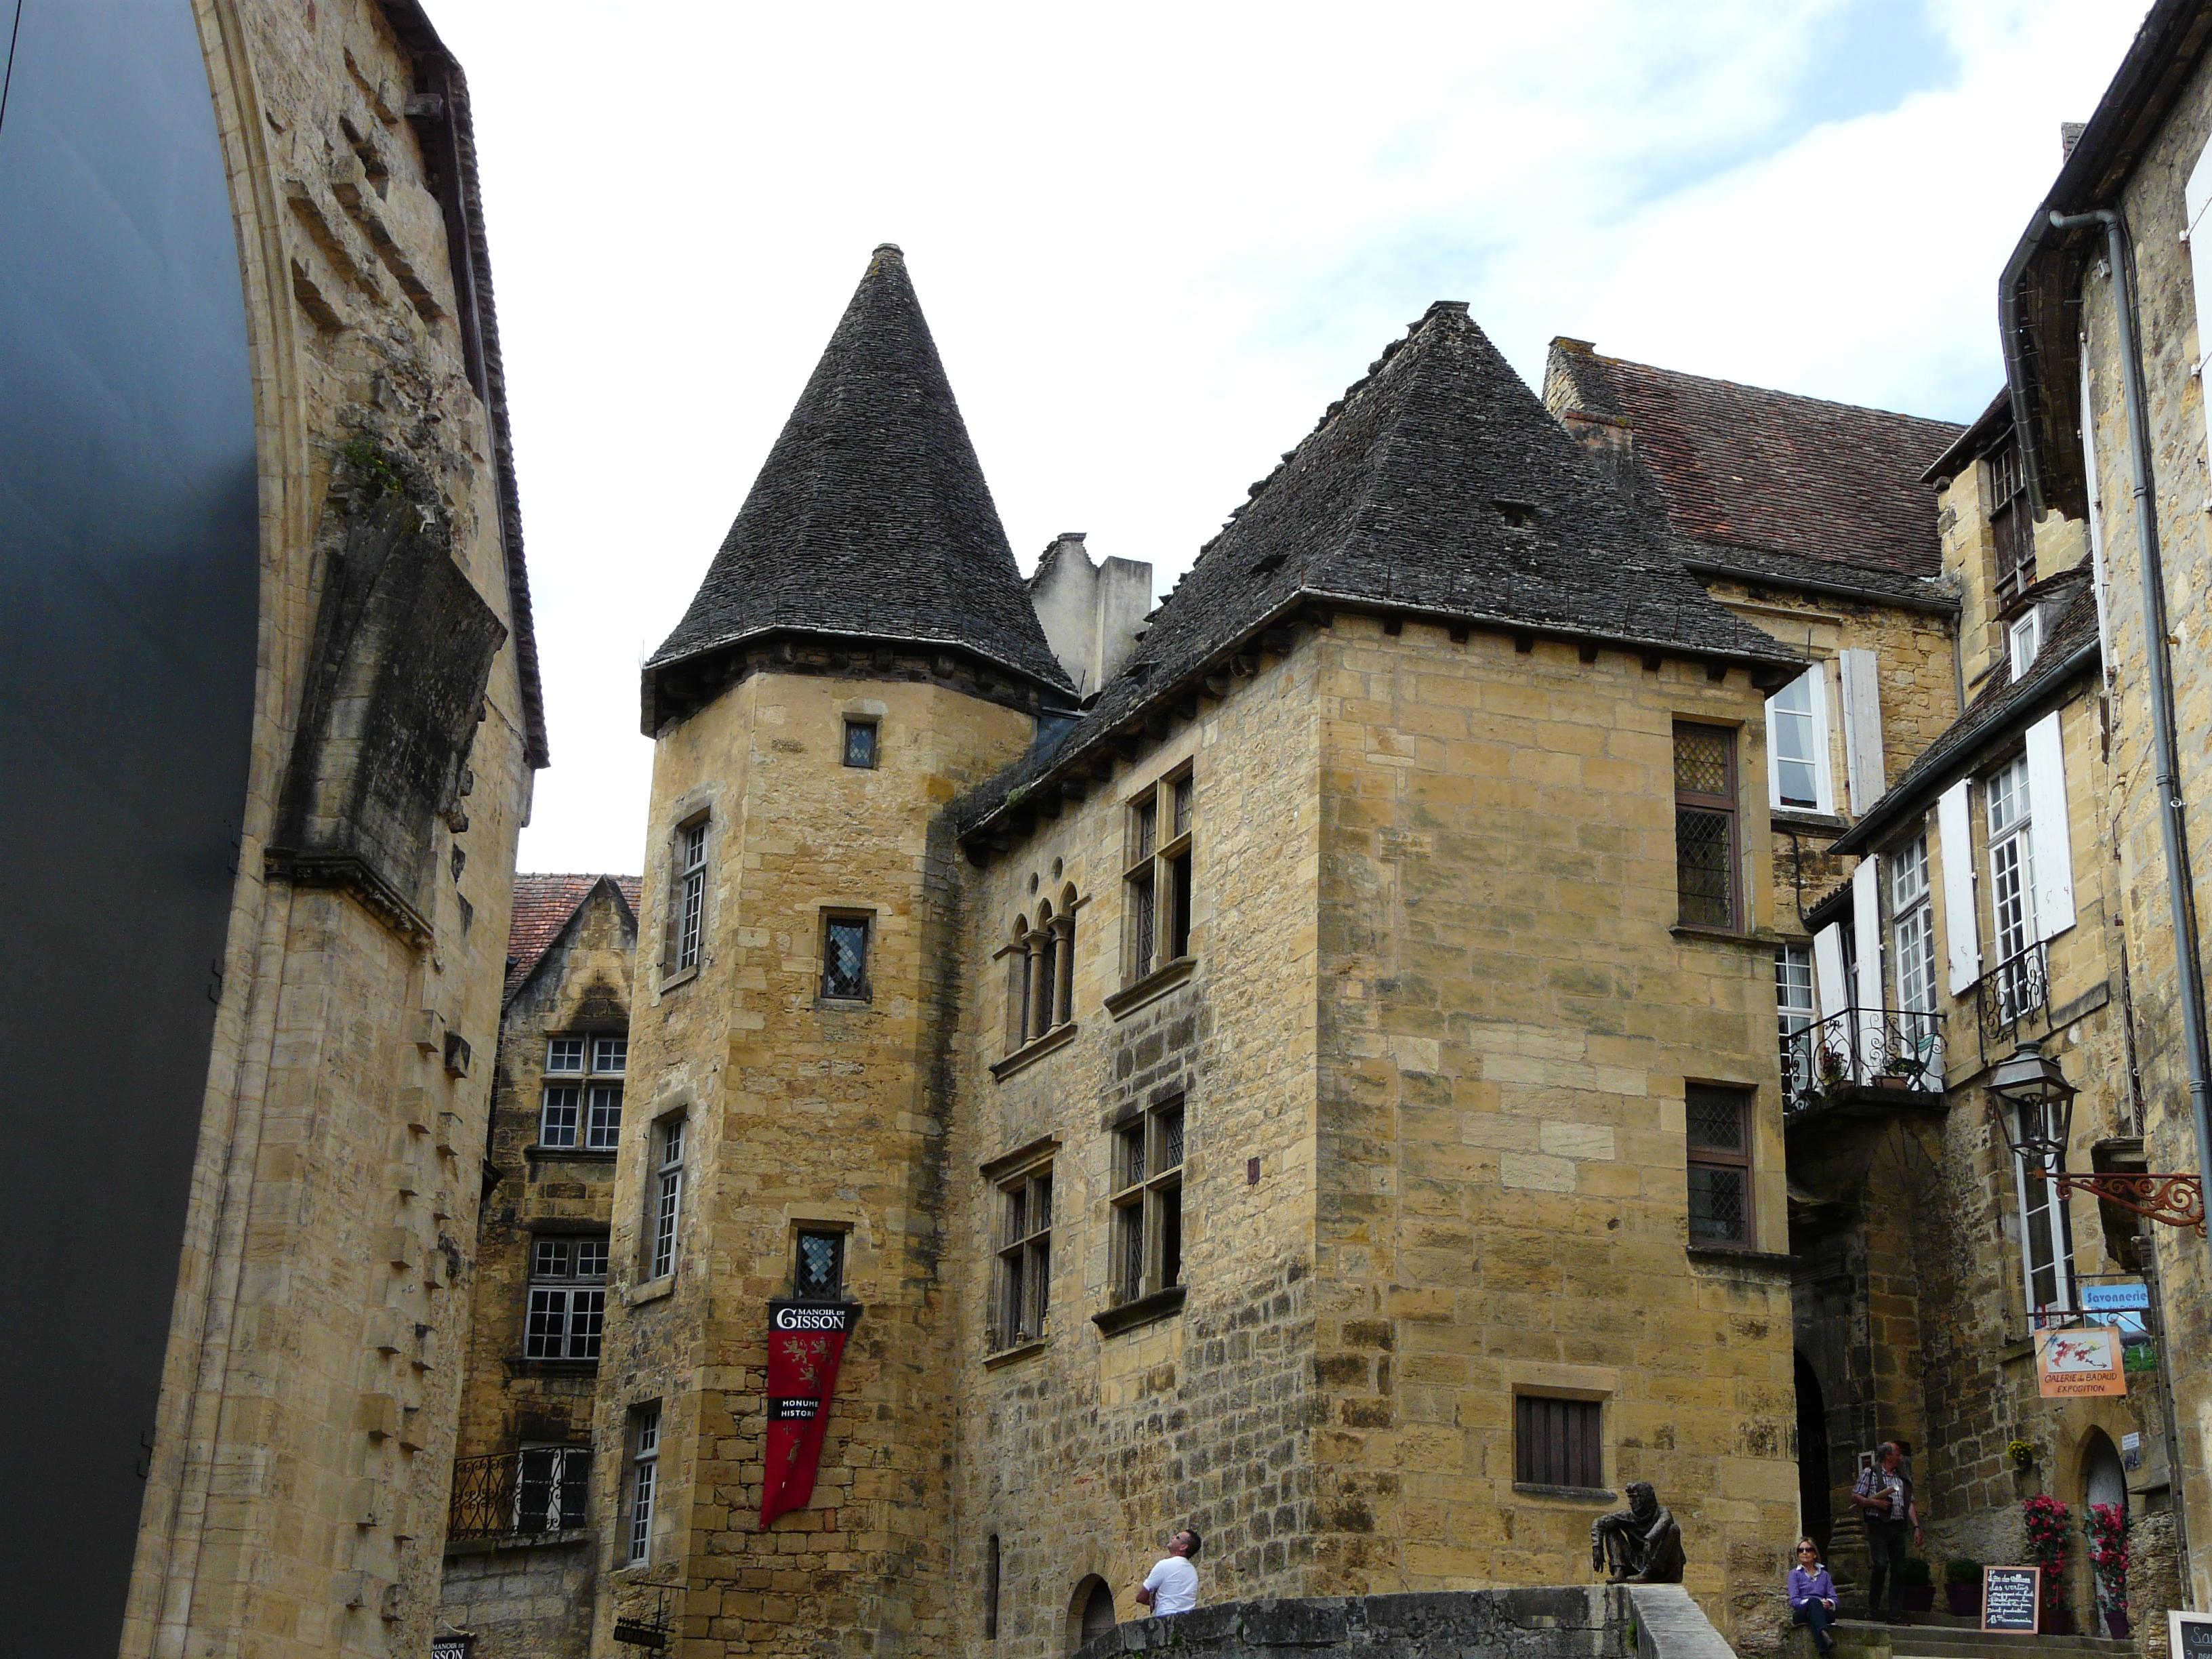 2150-sarlat-la-caneda_manoir_gisson-dordogne-nouvelle-aquitaine.jpg